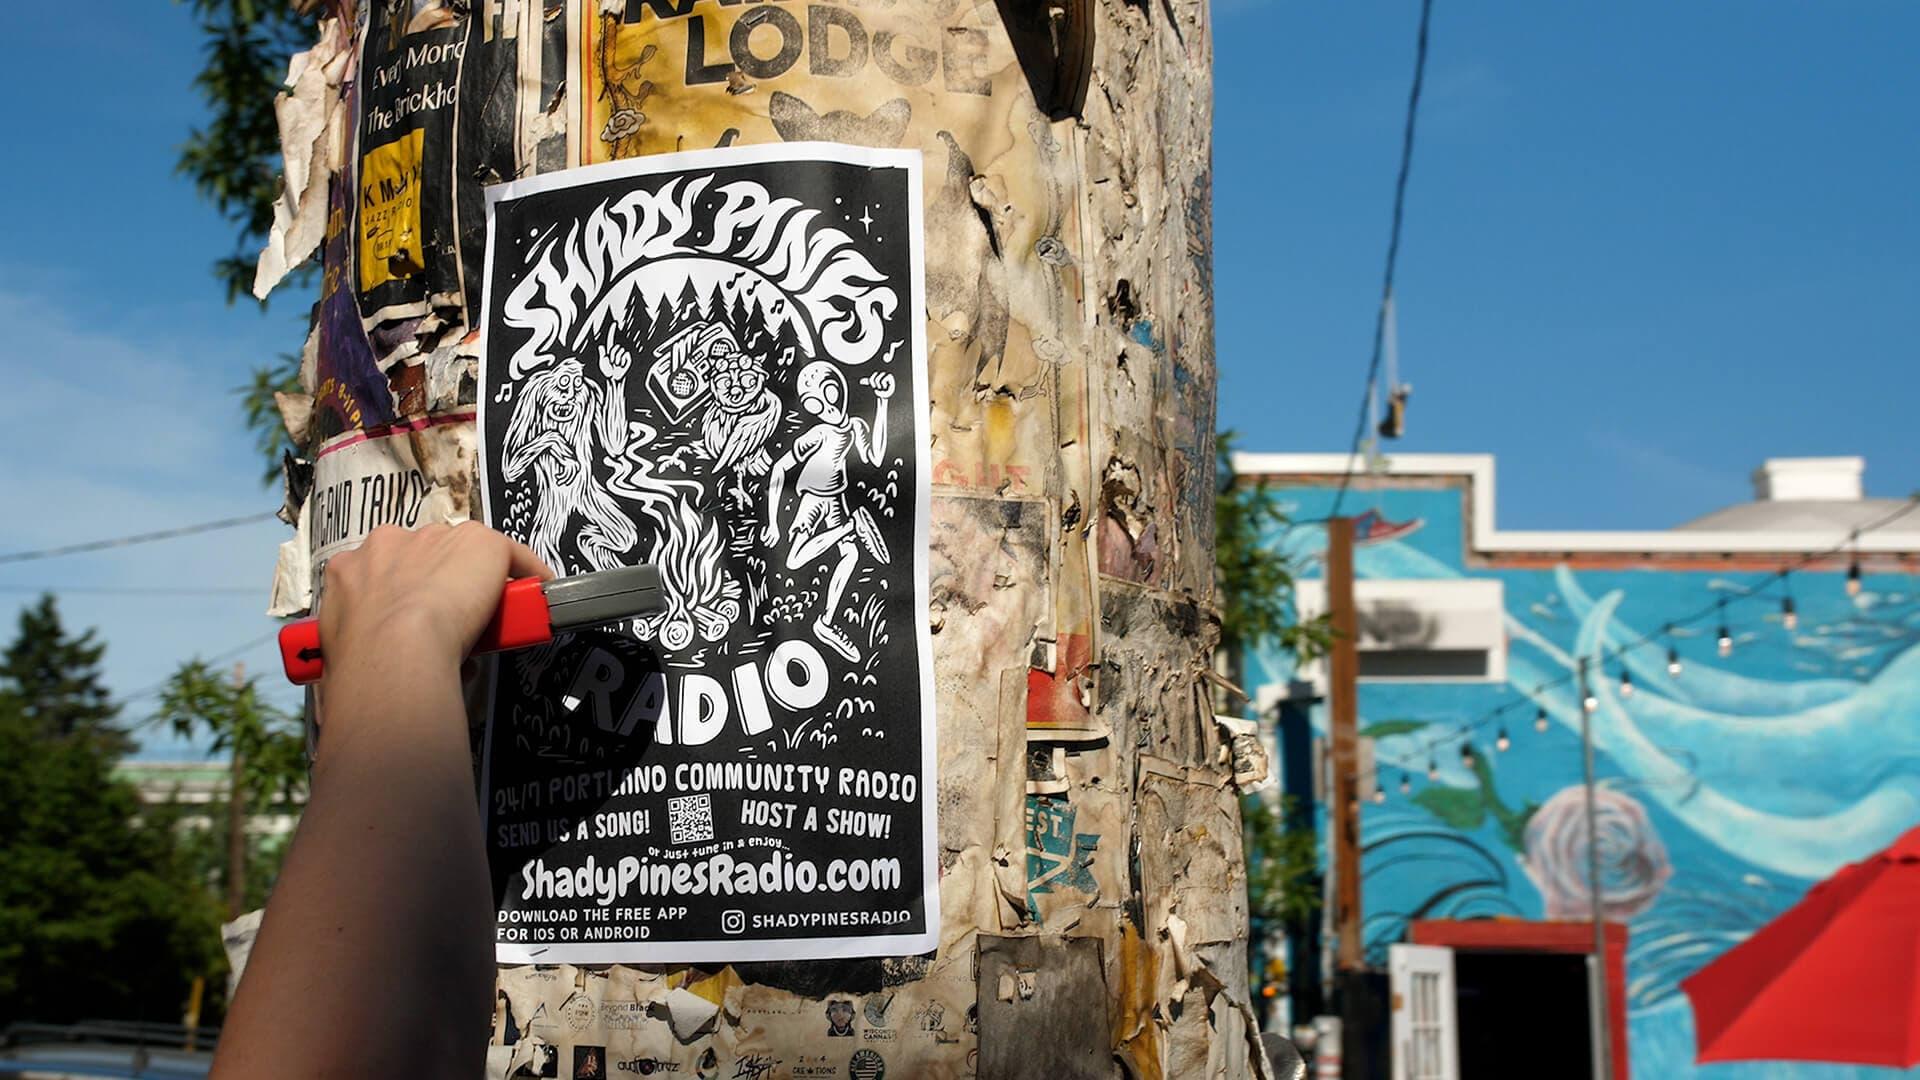 Shady Pines Radio poster